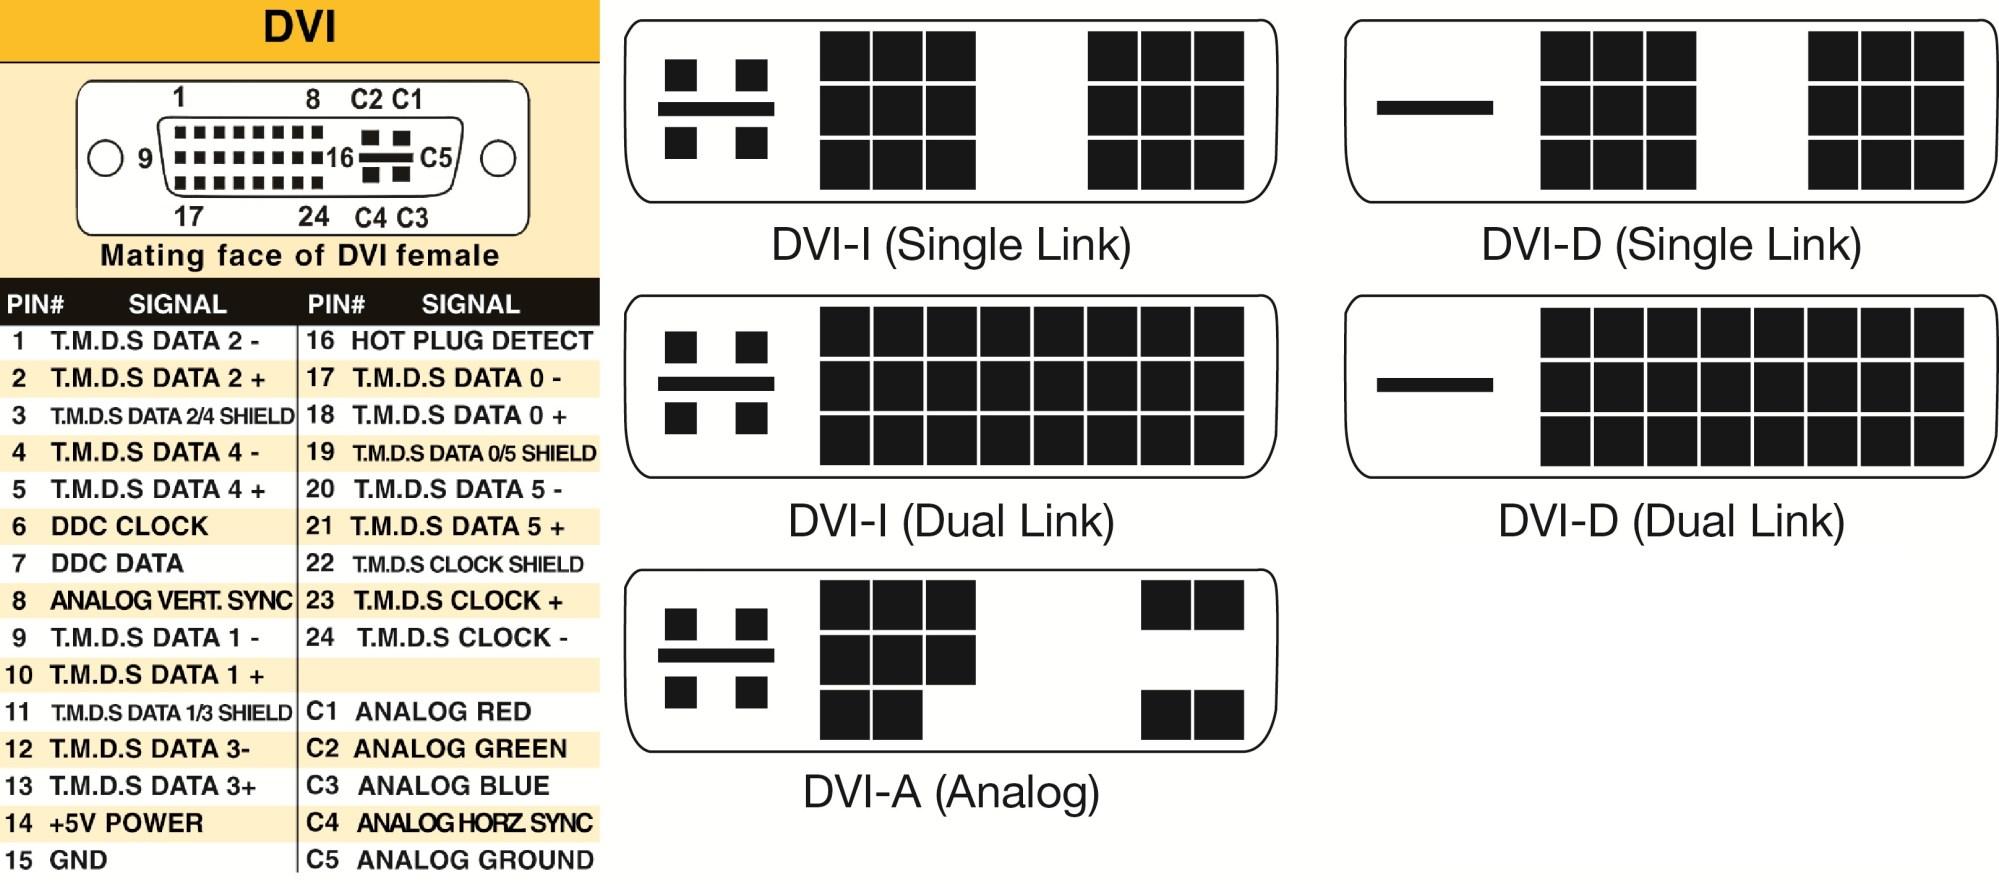 hight resolution of dvi pin diagram wiring diagram list dvi 24 pin diagram dvi pin diagram